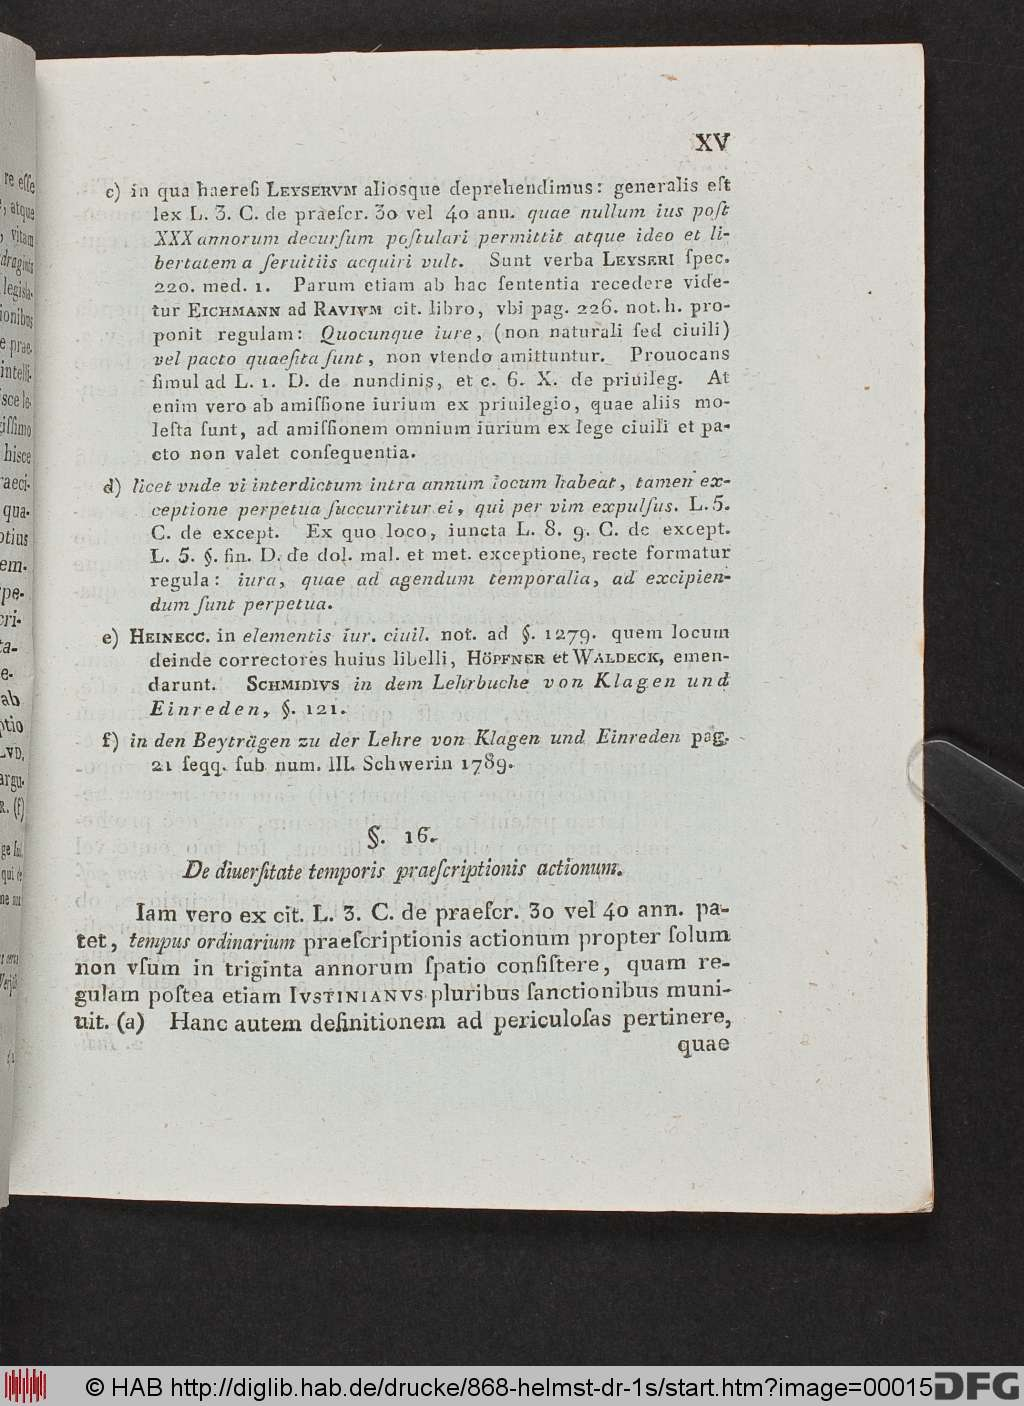 https://diglib.hab.de/drucke/868-helmst-dr-1s/00015.jpg